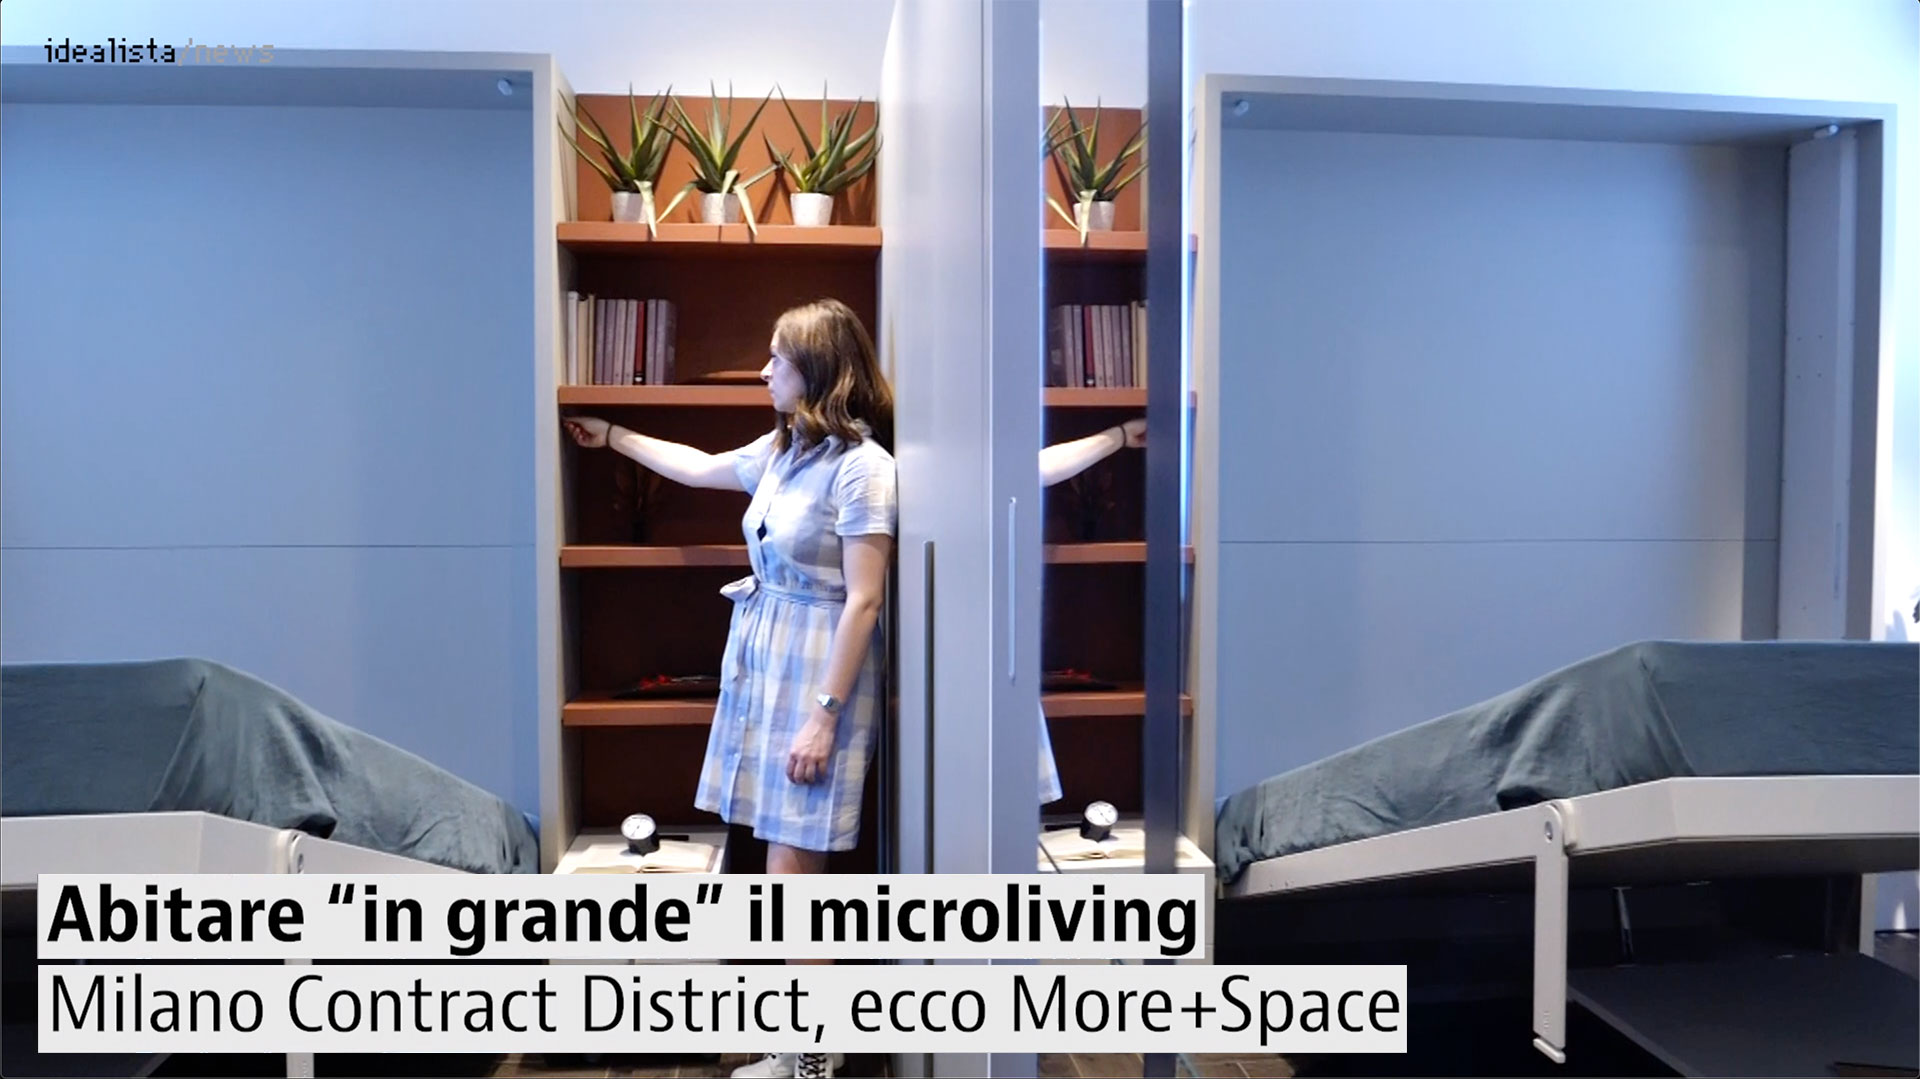 Microliving